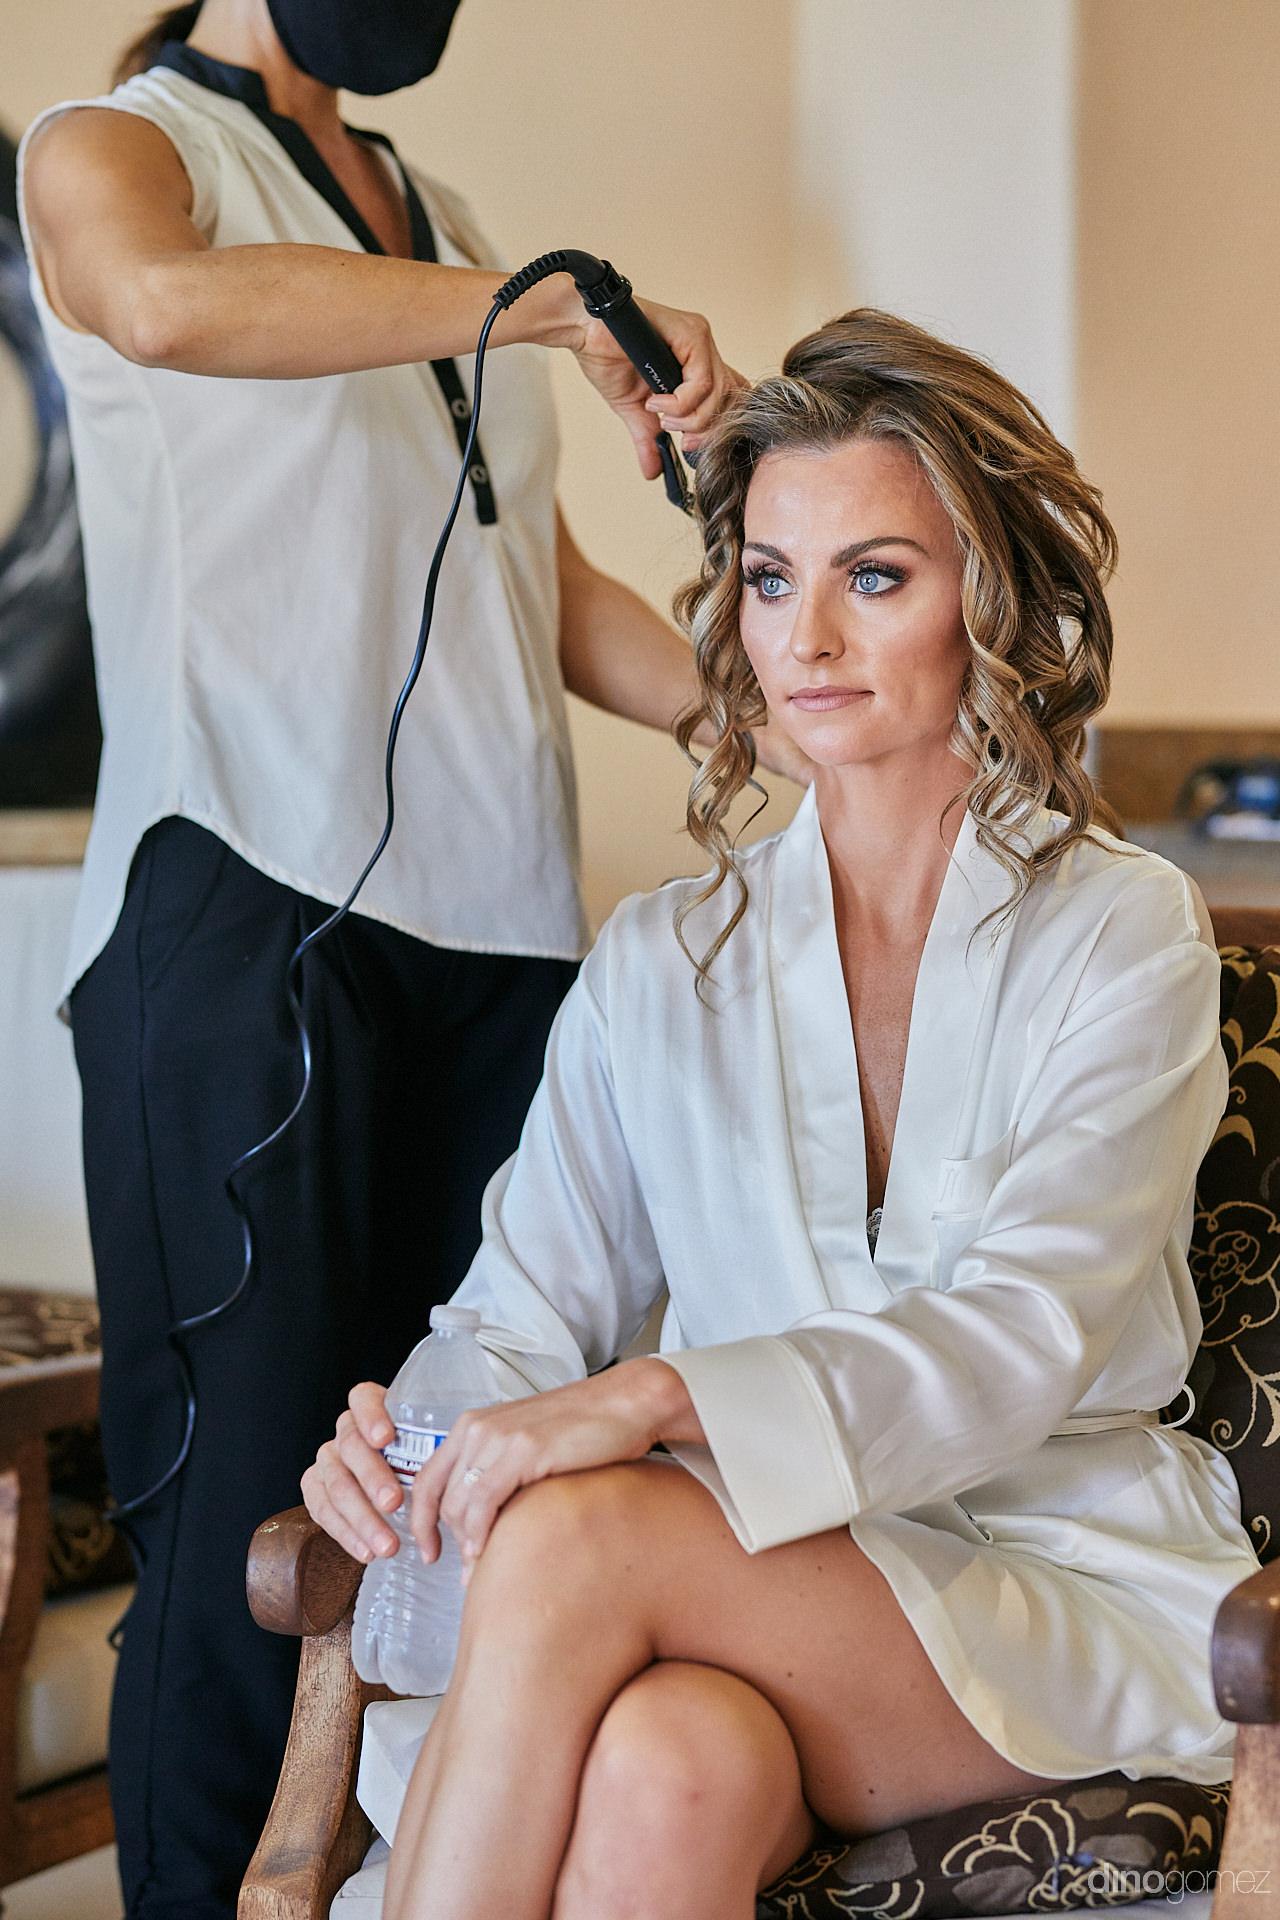 Cabo Photographer - Luxury Wedding Photographer In Cabo Dino Gomez - C&T